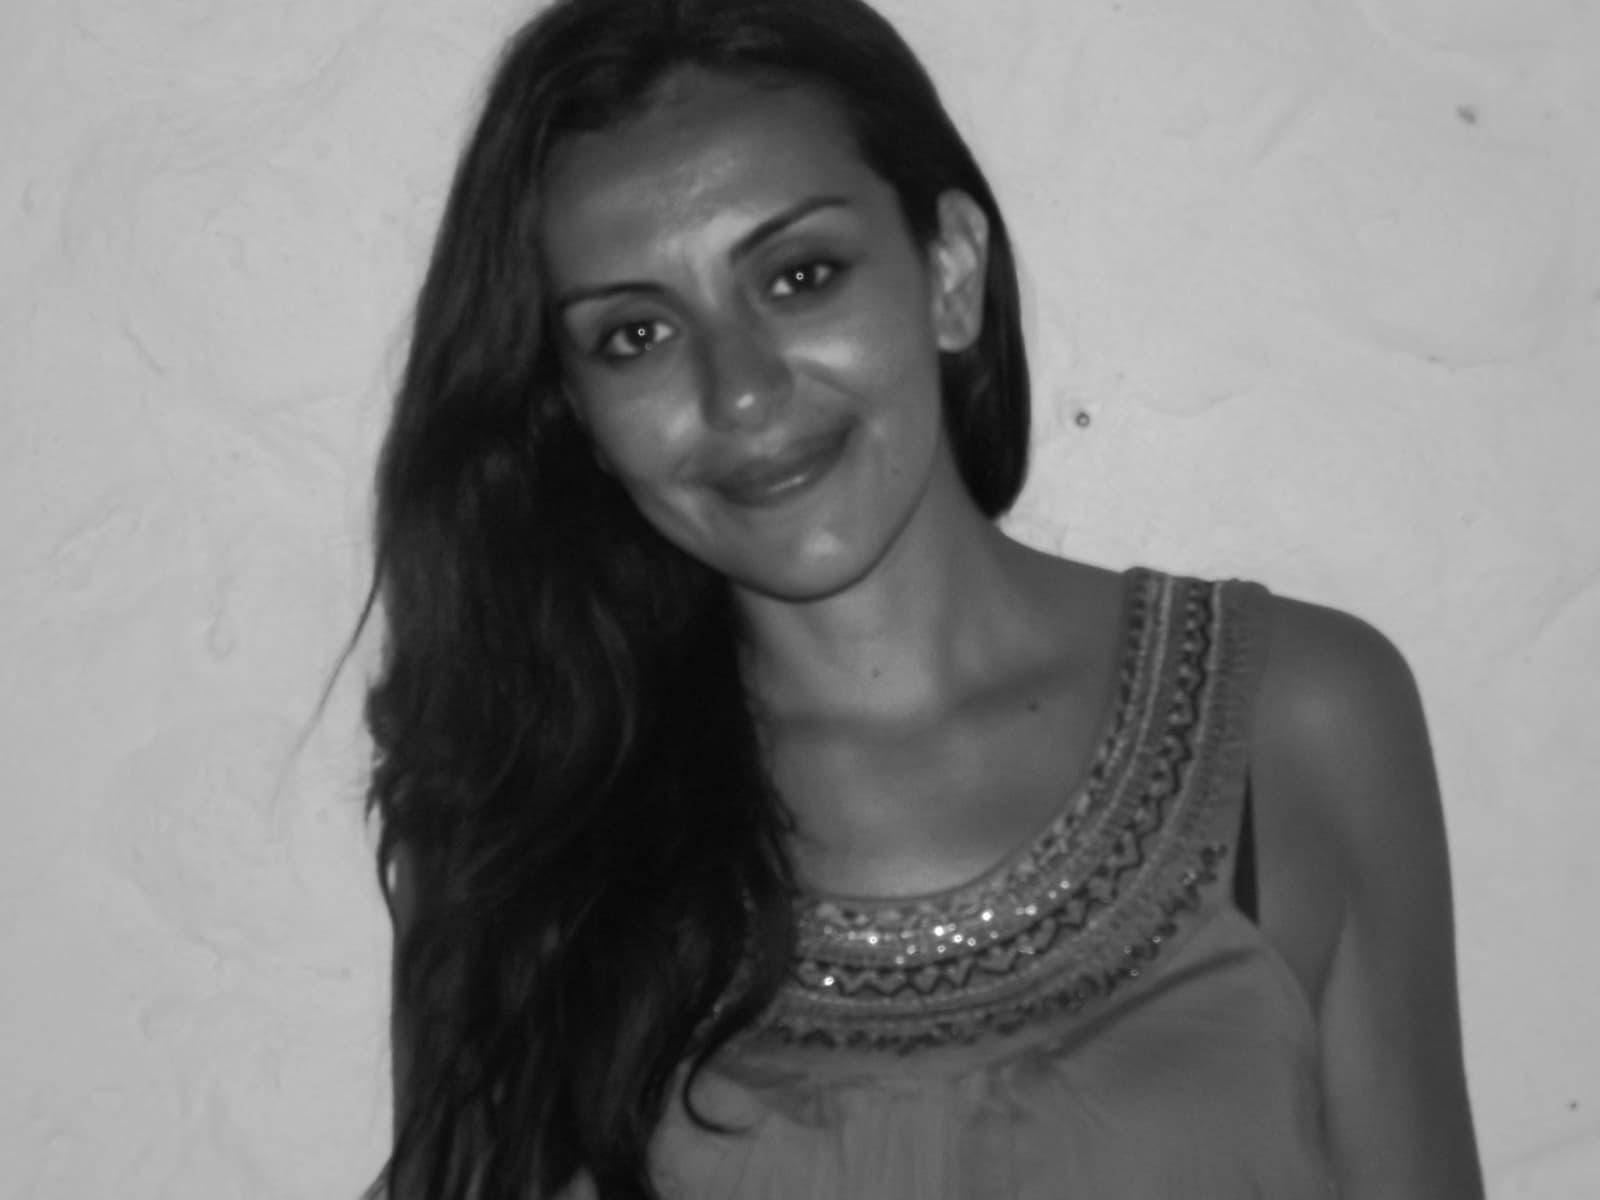 Sarah from Paris, France